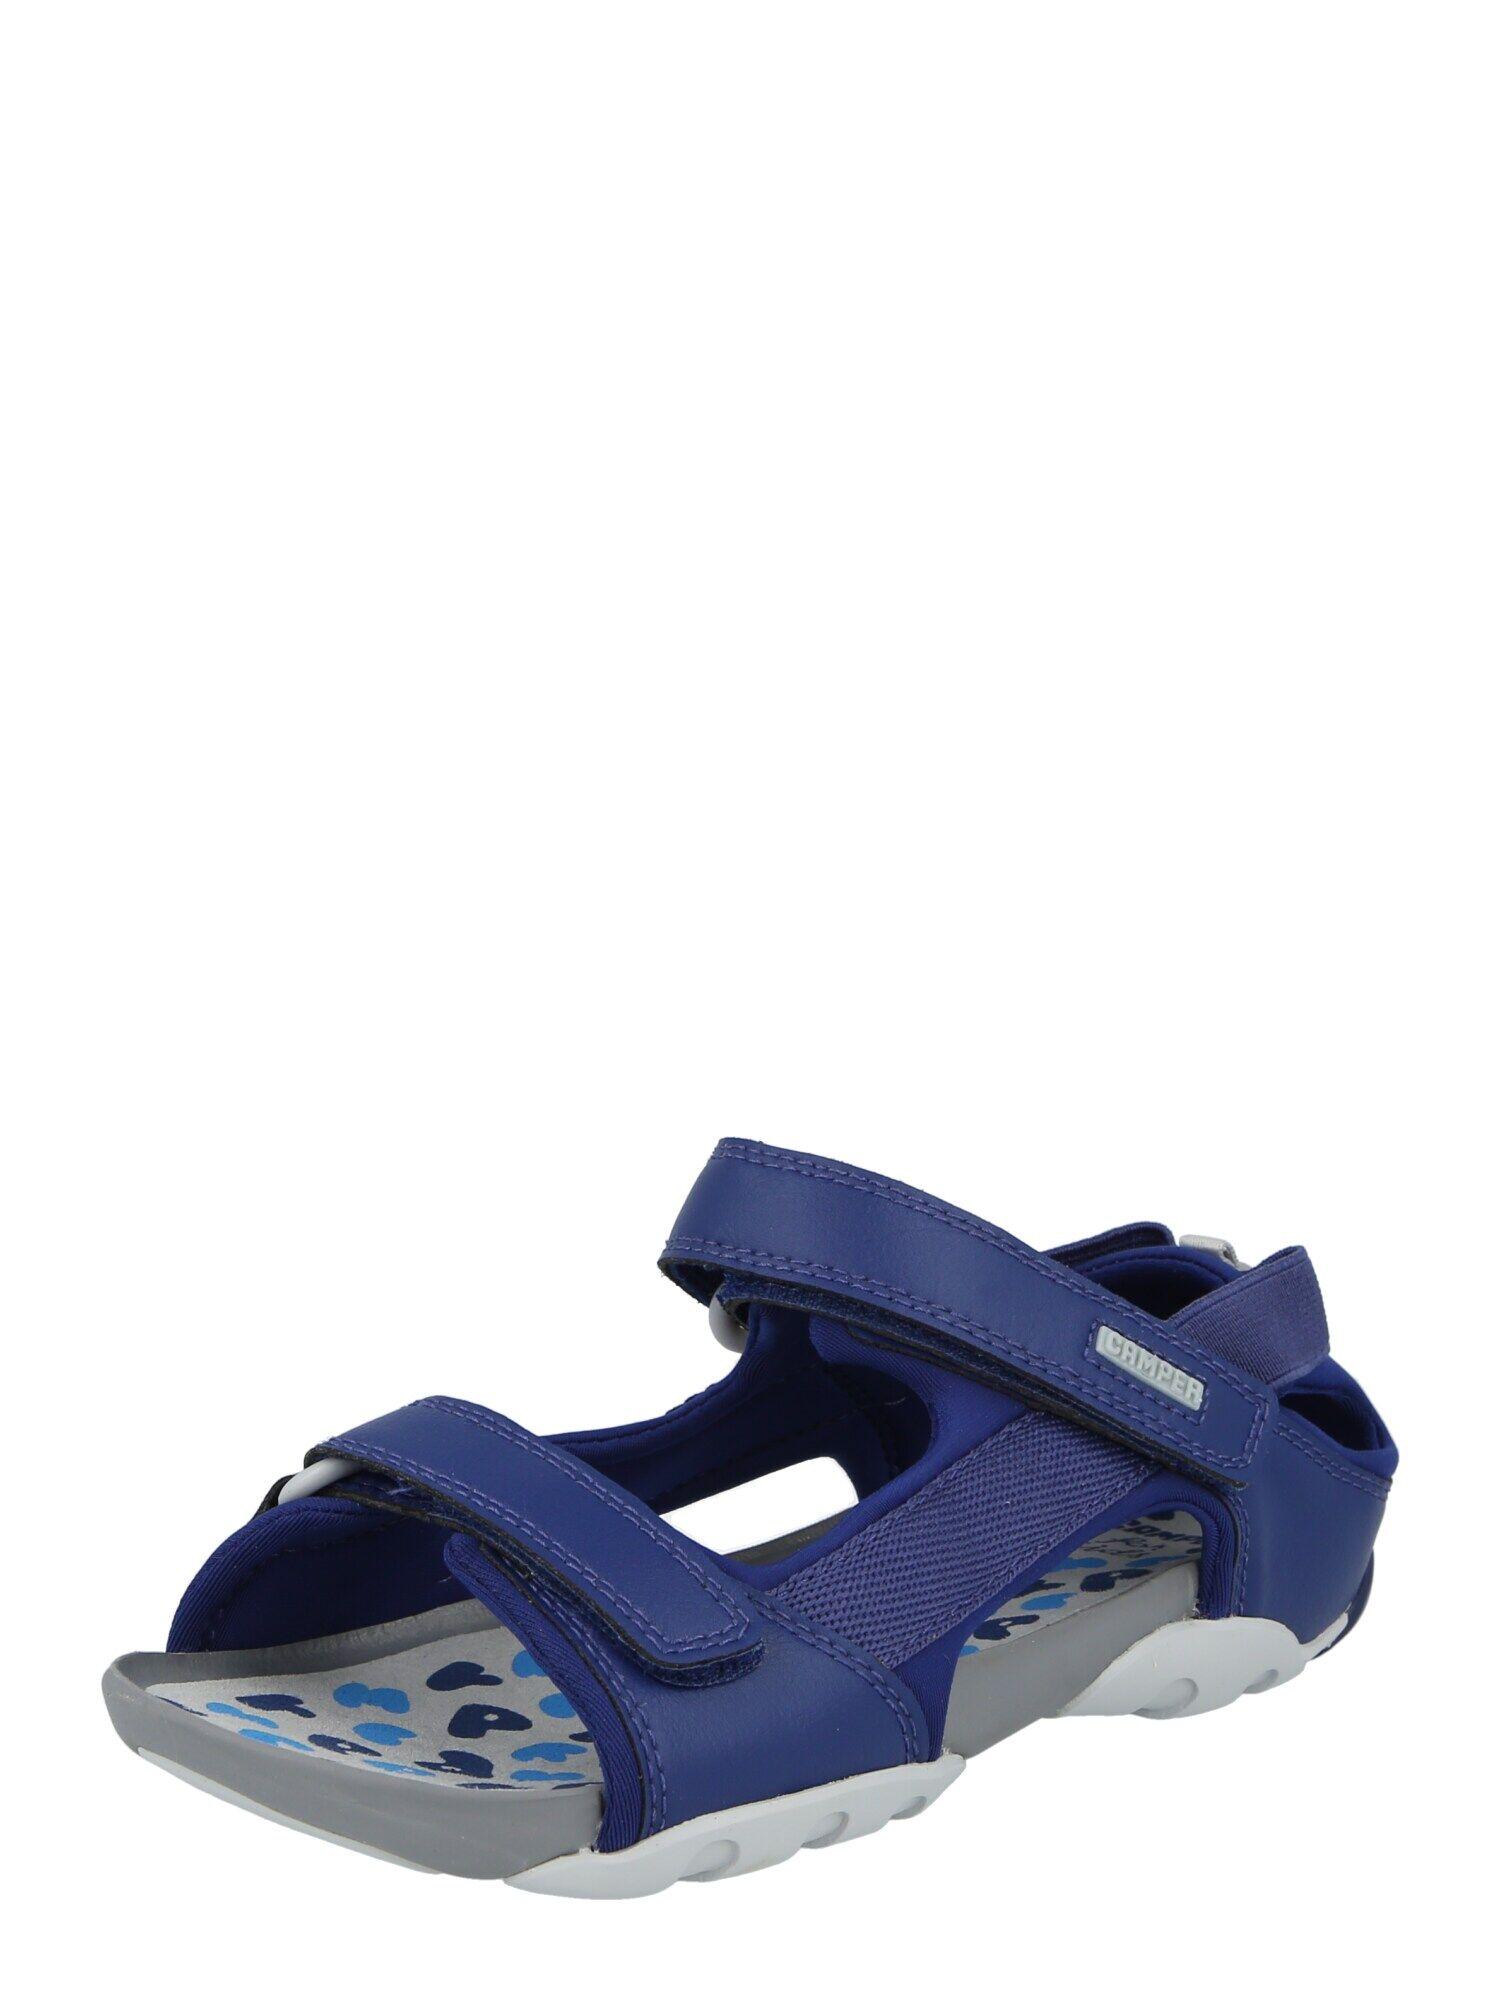 CAMPER Sandalo 'Wous' Blu